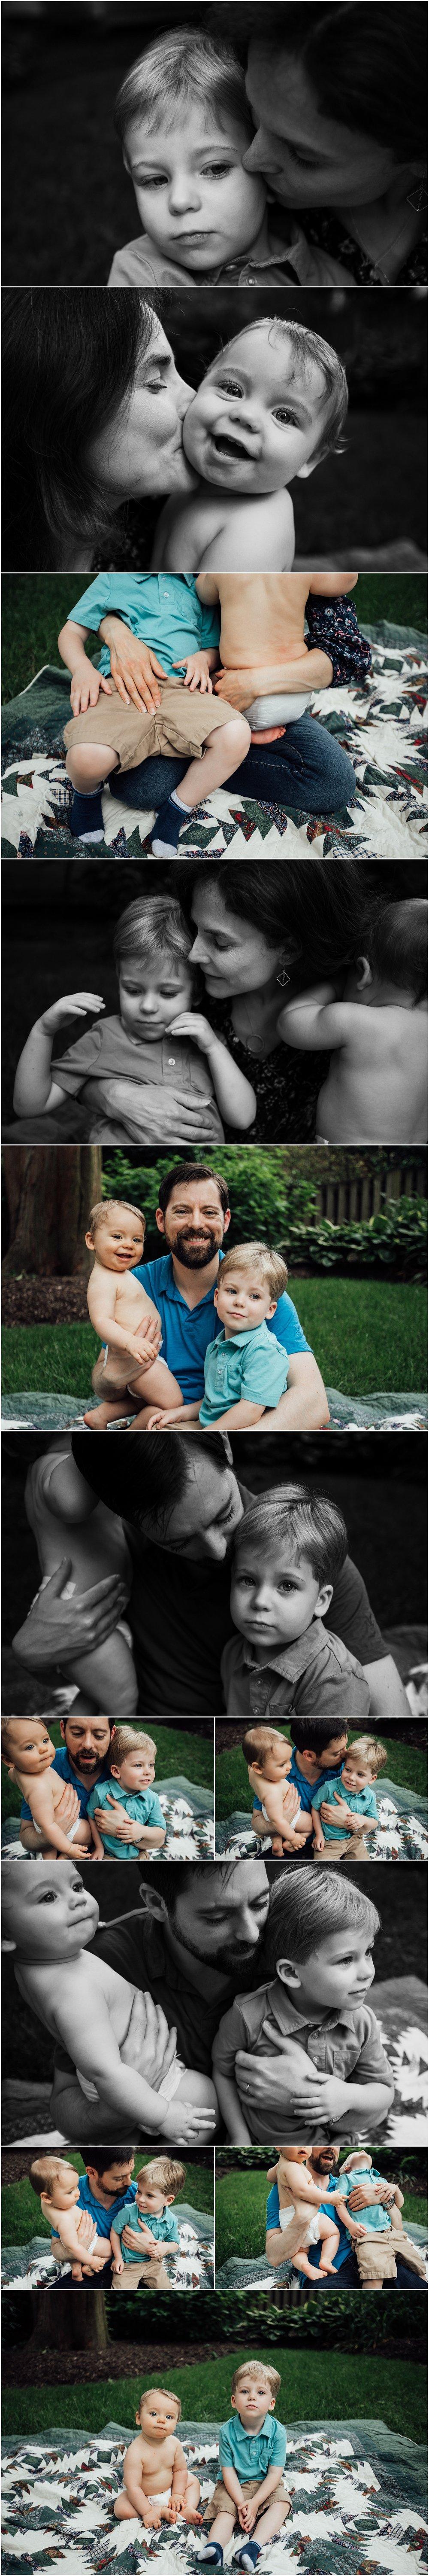 emotive family session by Huntsville Alabama family photographer Rachel K Photo